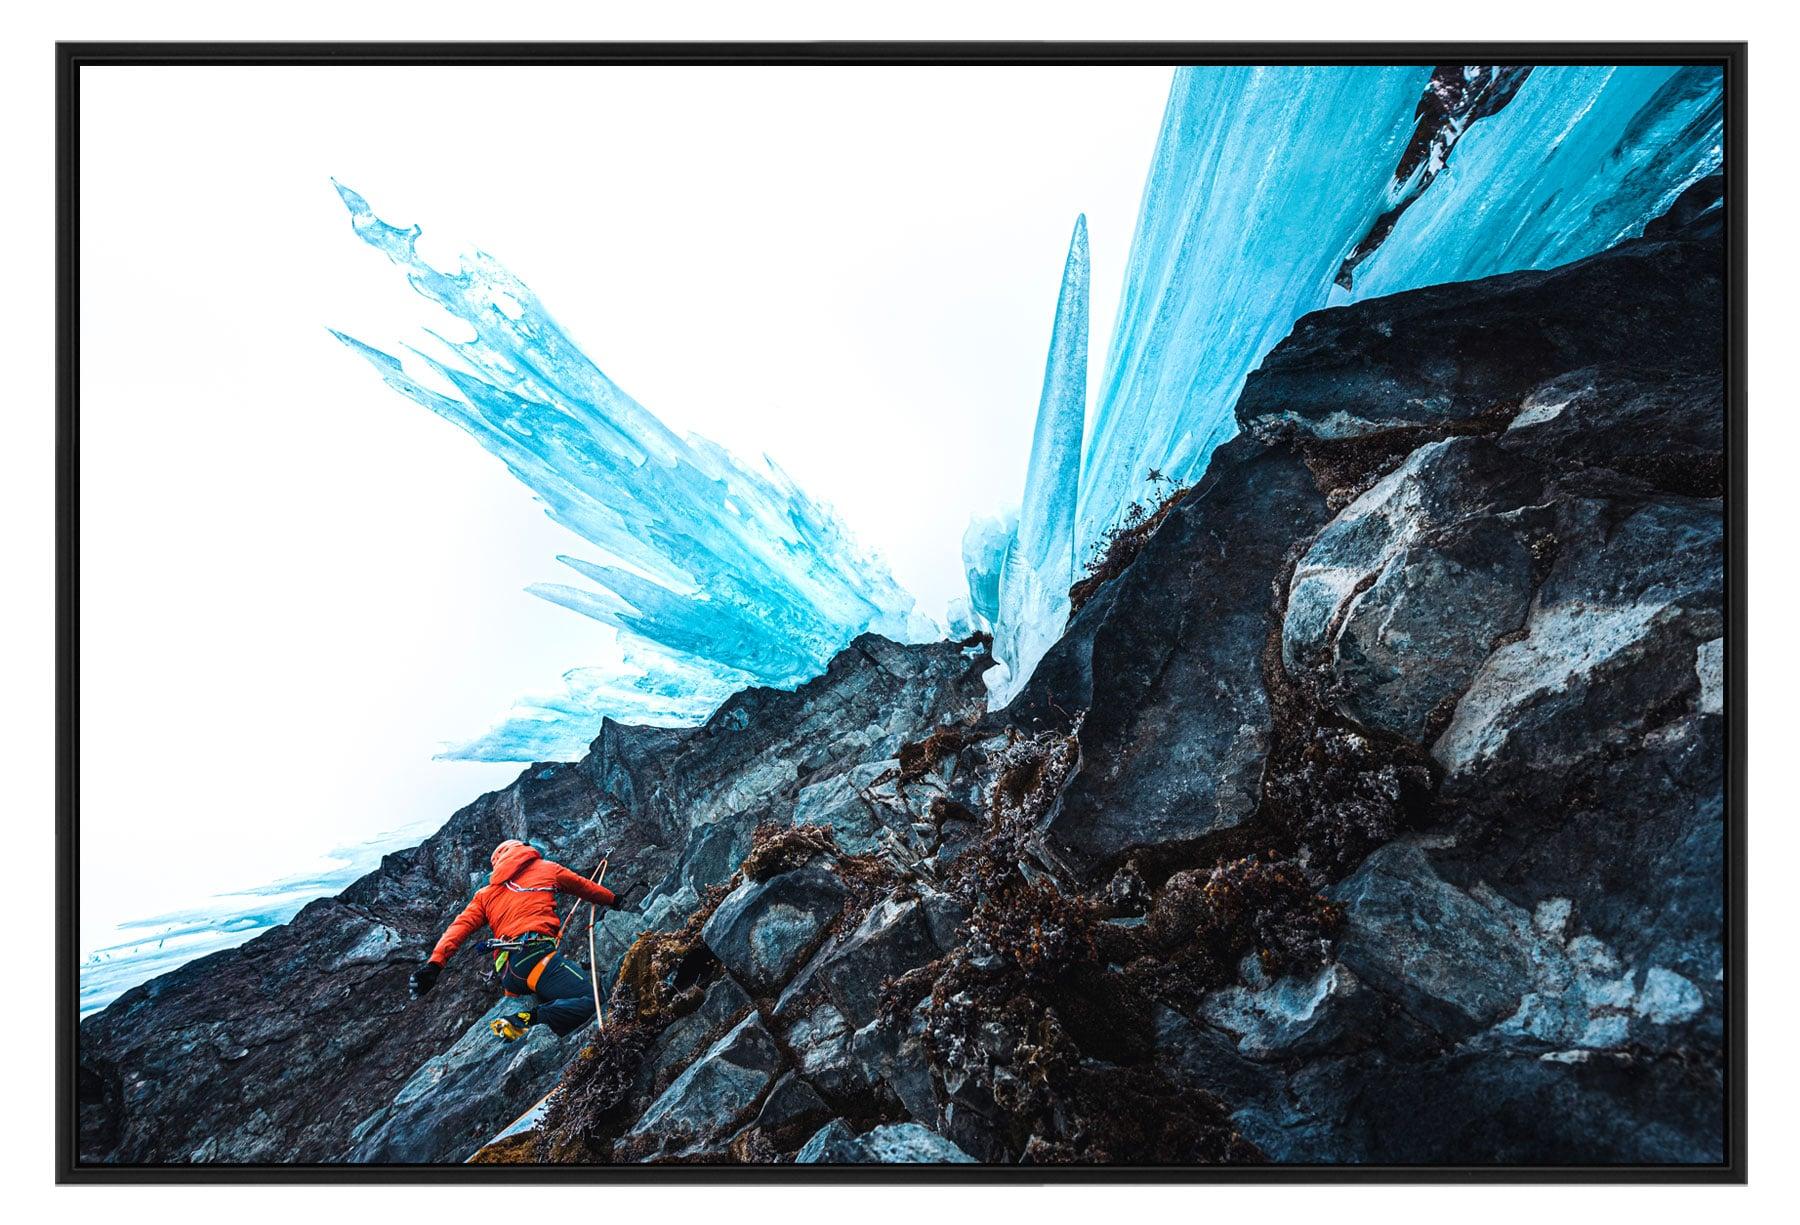 Tirage photo de cascade de glace et de ski